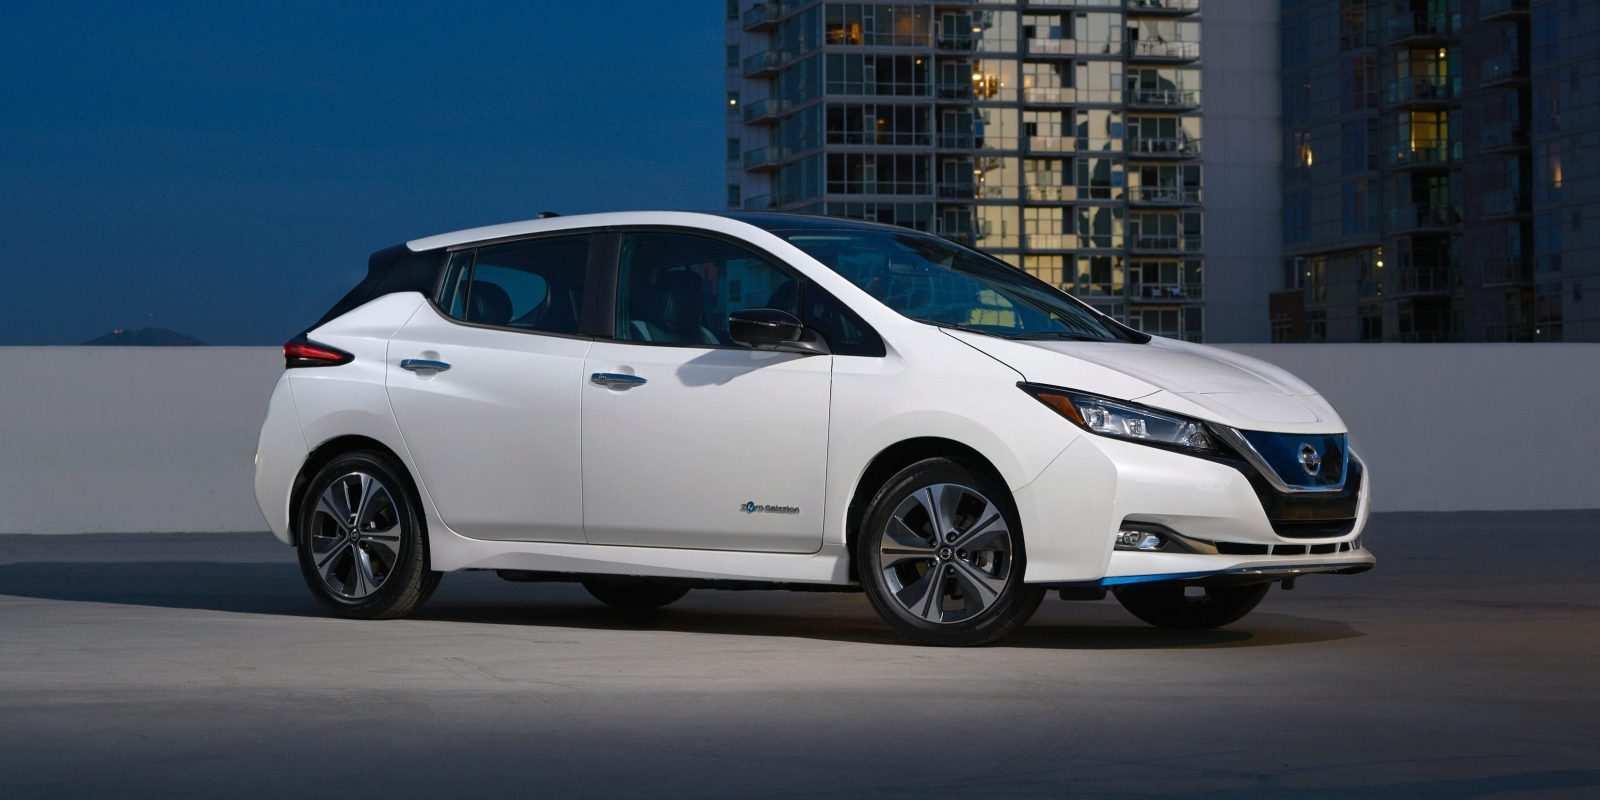 54 Gallery of 2019 Nissan Leaf Spy Shoot for 2019 Nissan Leaf